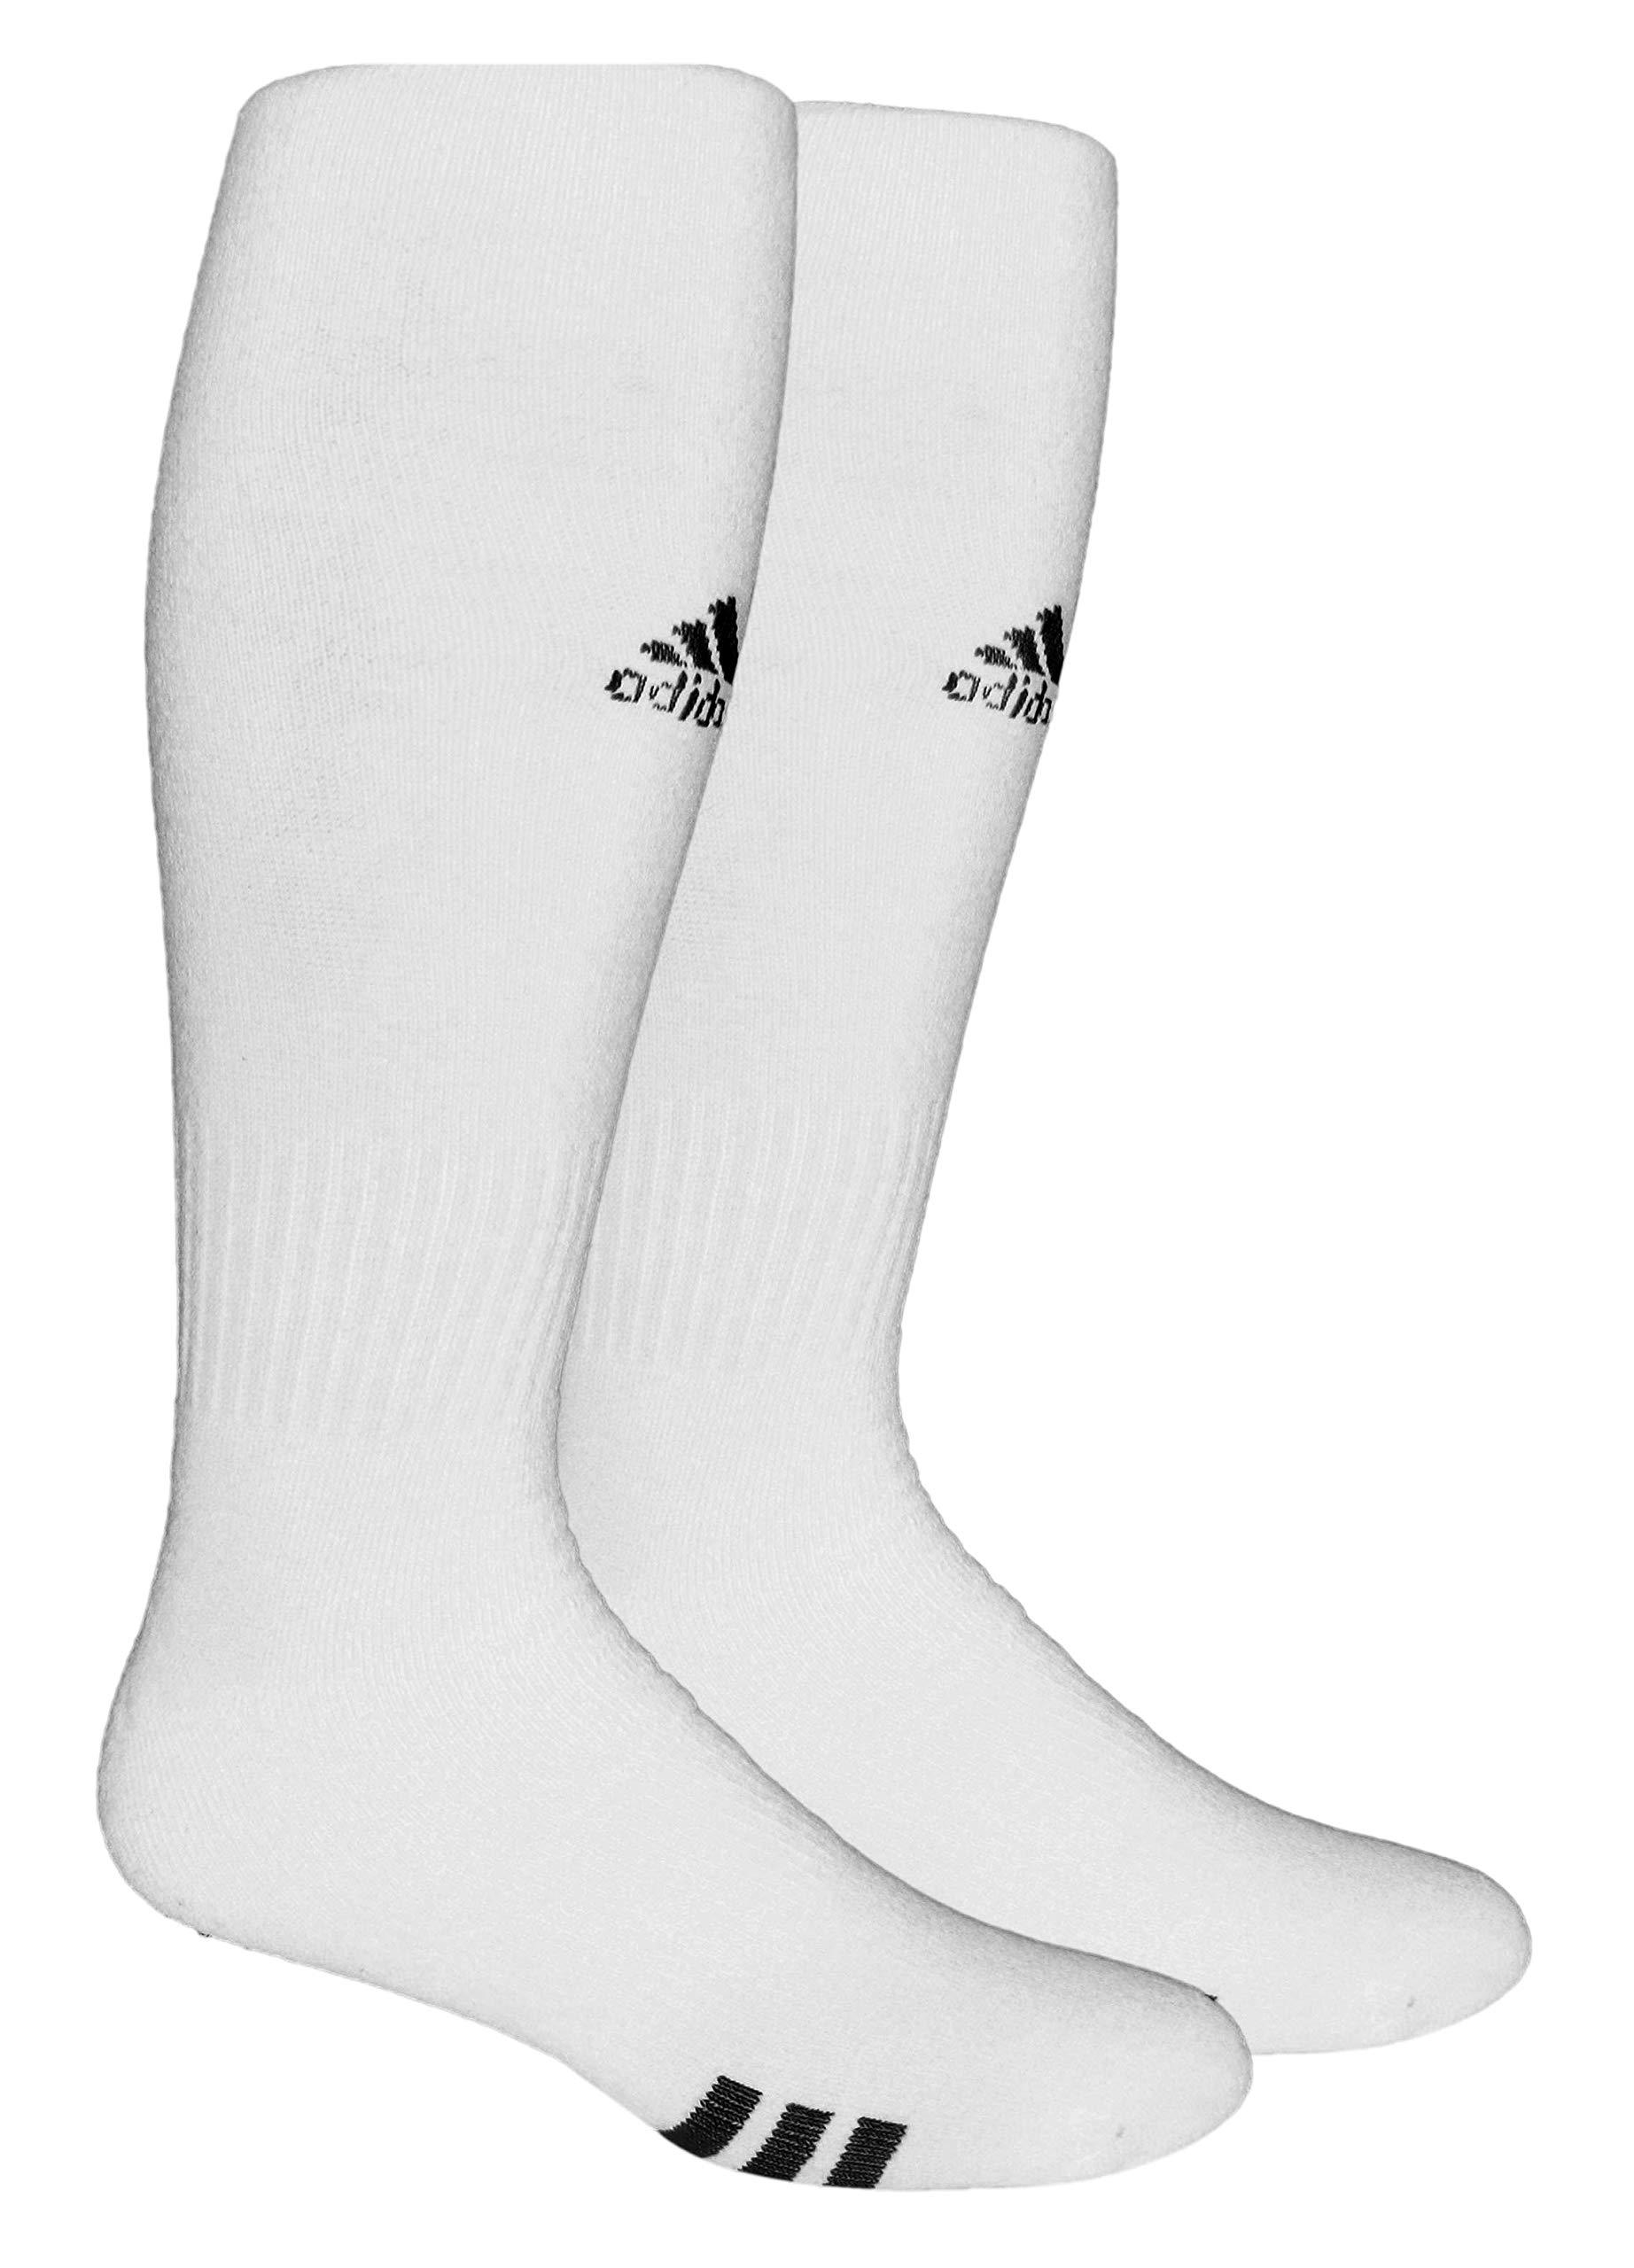 adidas Unisex Rivalry Field OTC Sock (2-Pair), White/Black, 5-8.5 by adidas